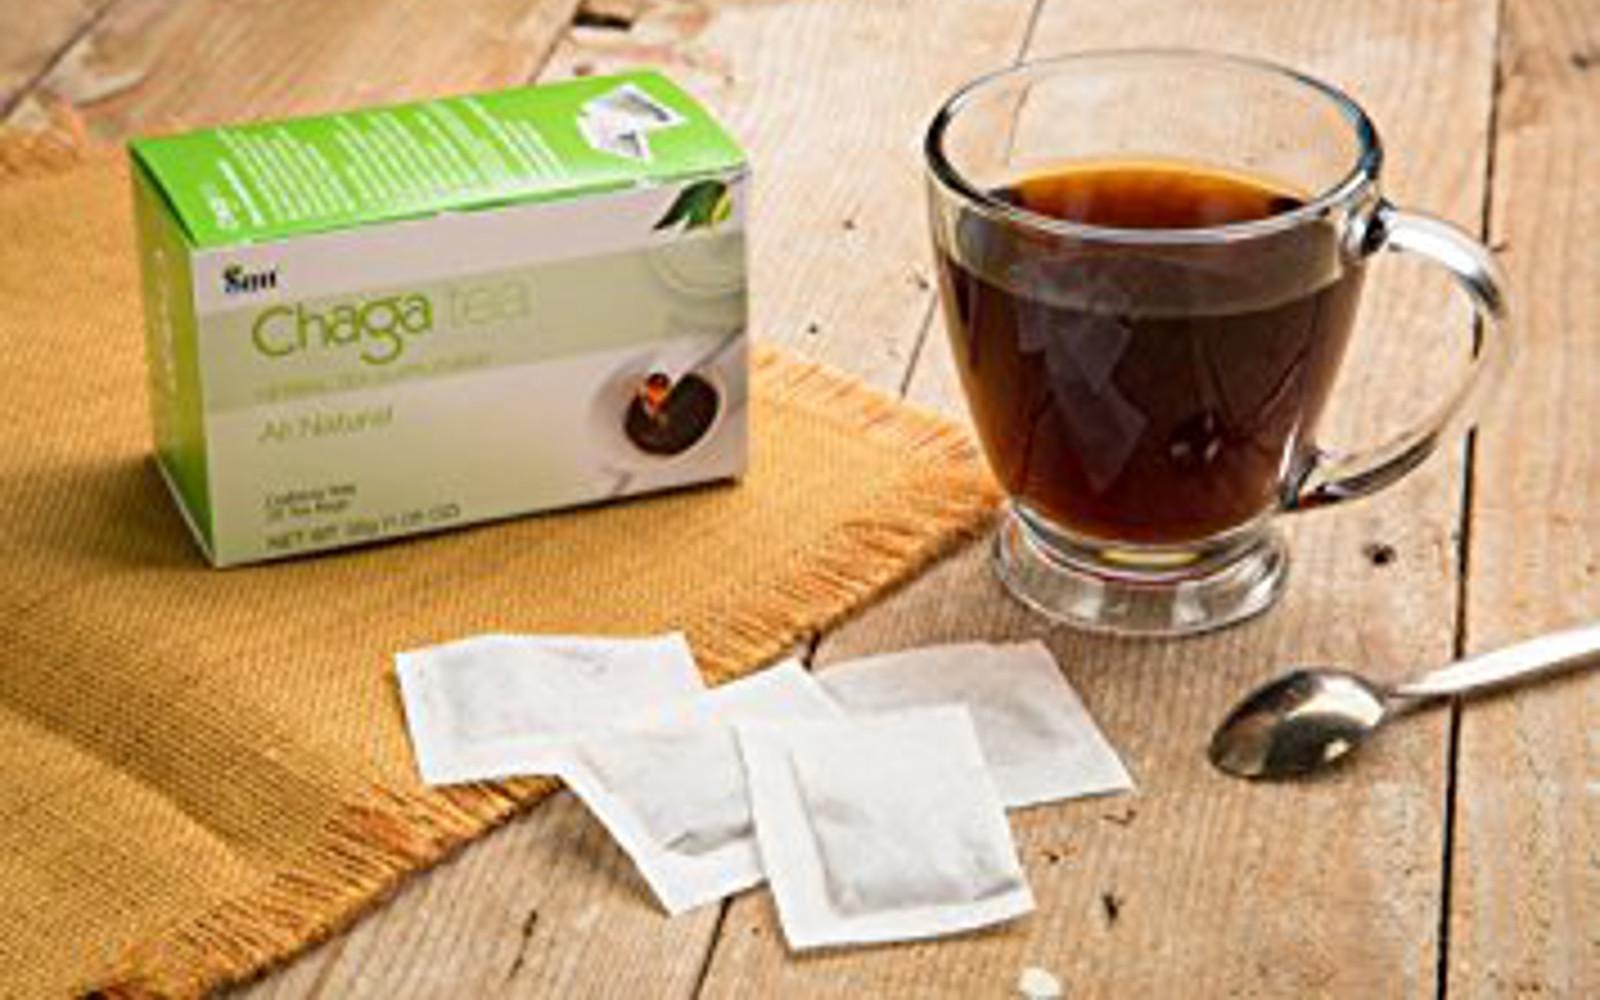 Sayan Siberian Chaga Mushroom Tea (Unbleached 20 Tea Bags, Caffeine Free) picture with tea made